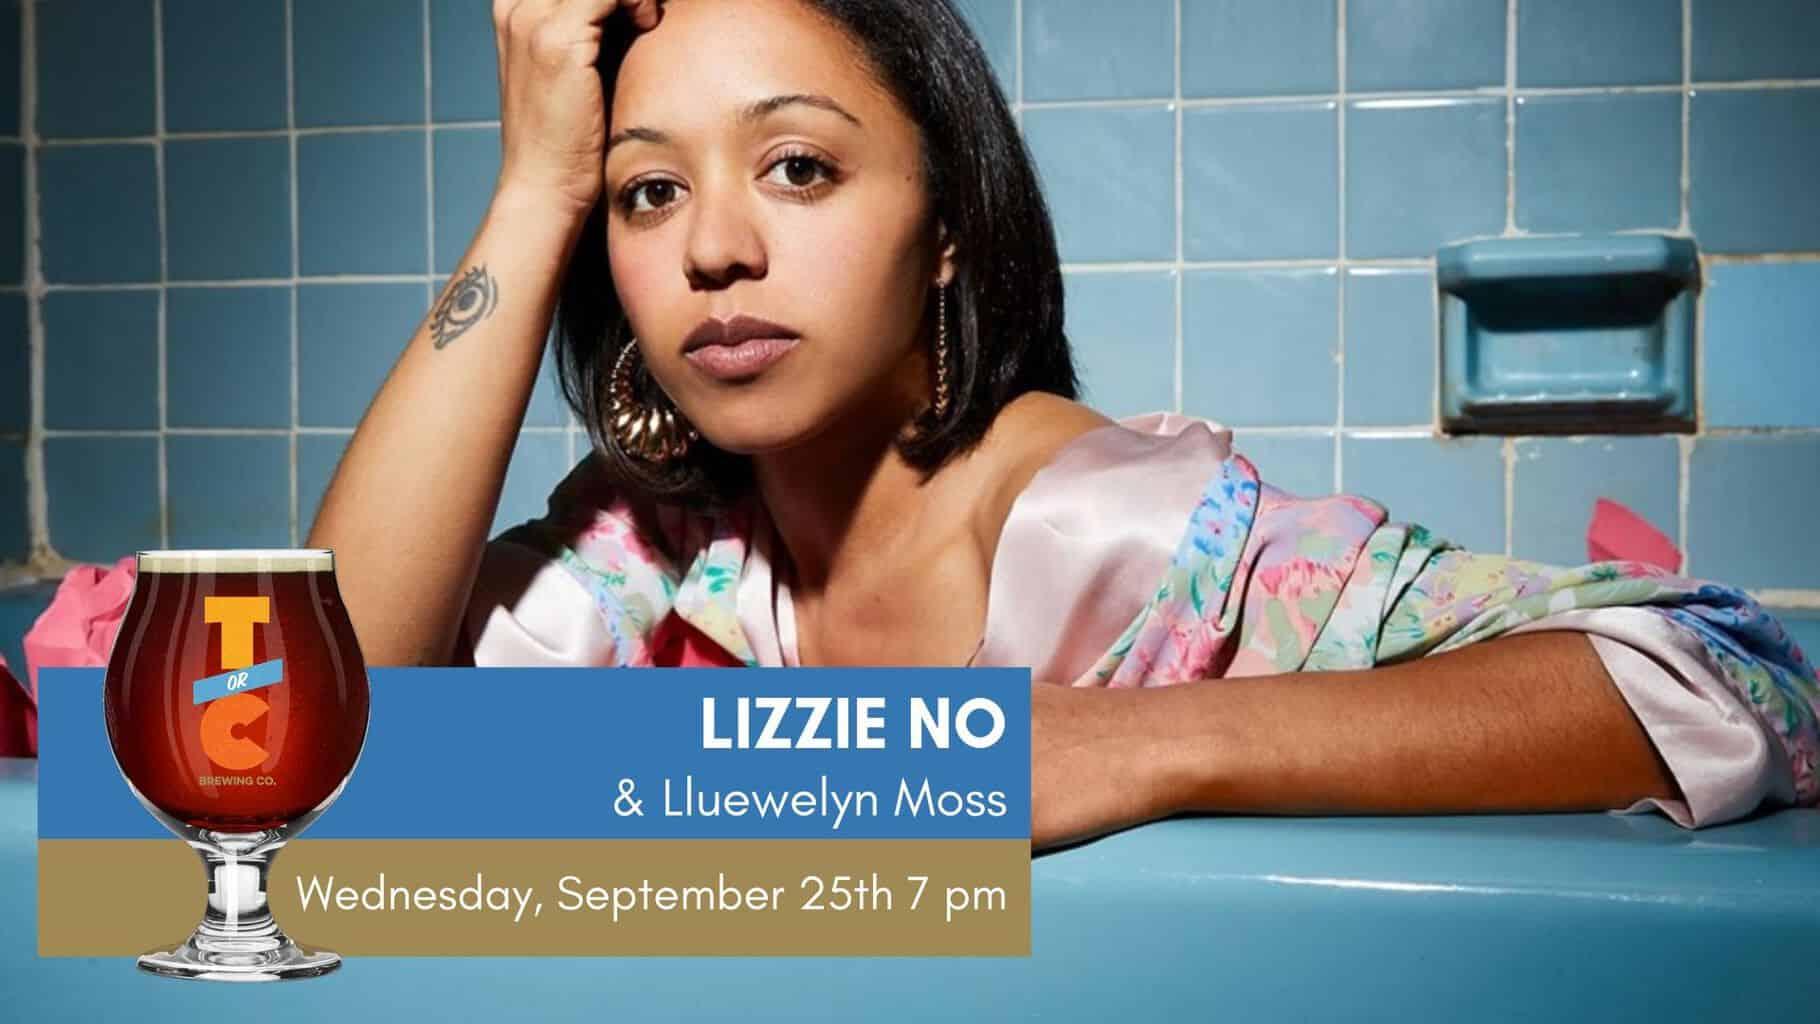 Lizzie No & Lluwelyn Moss